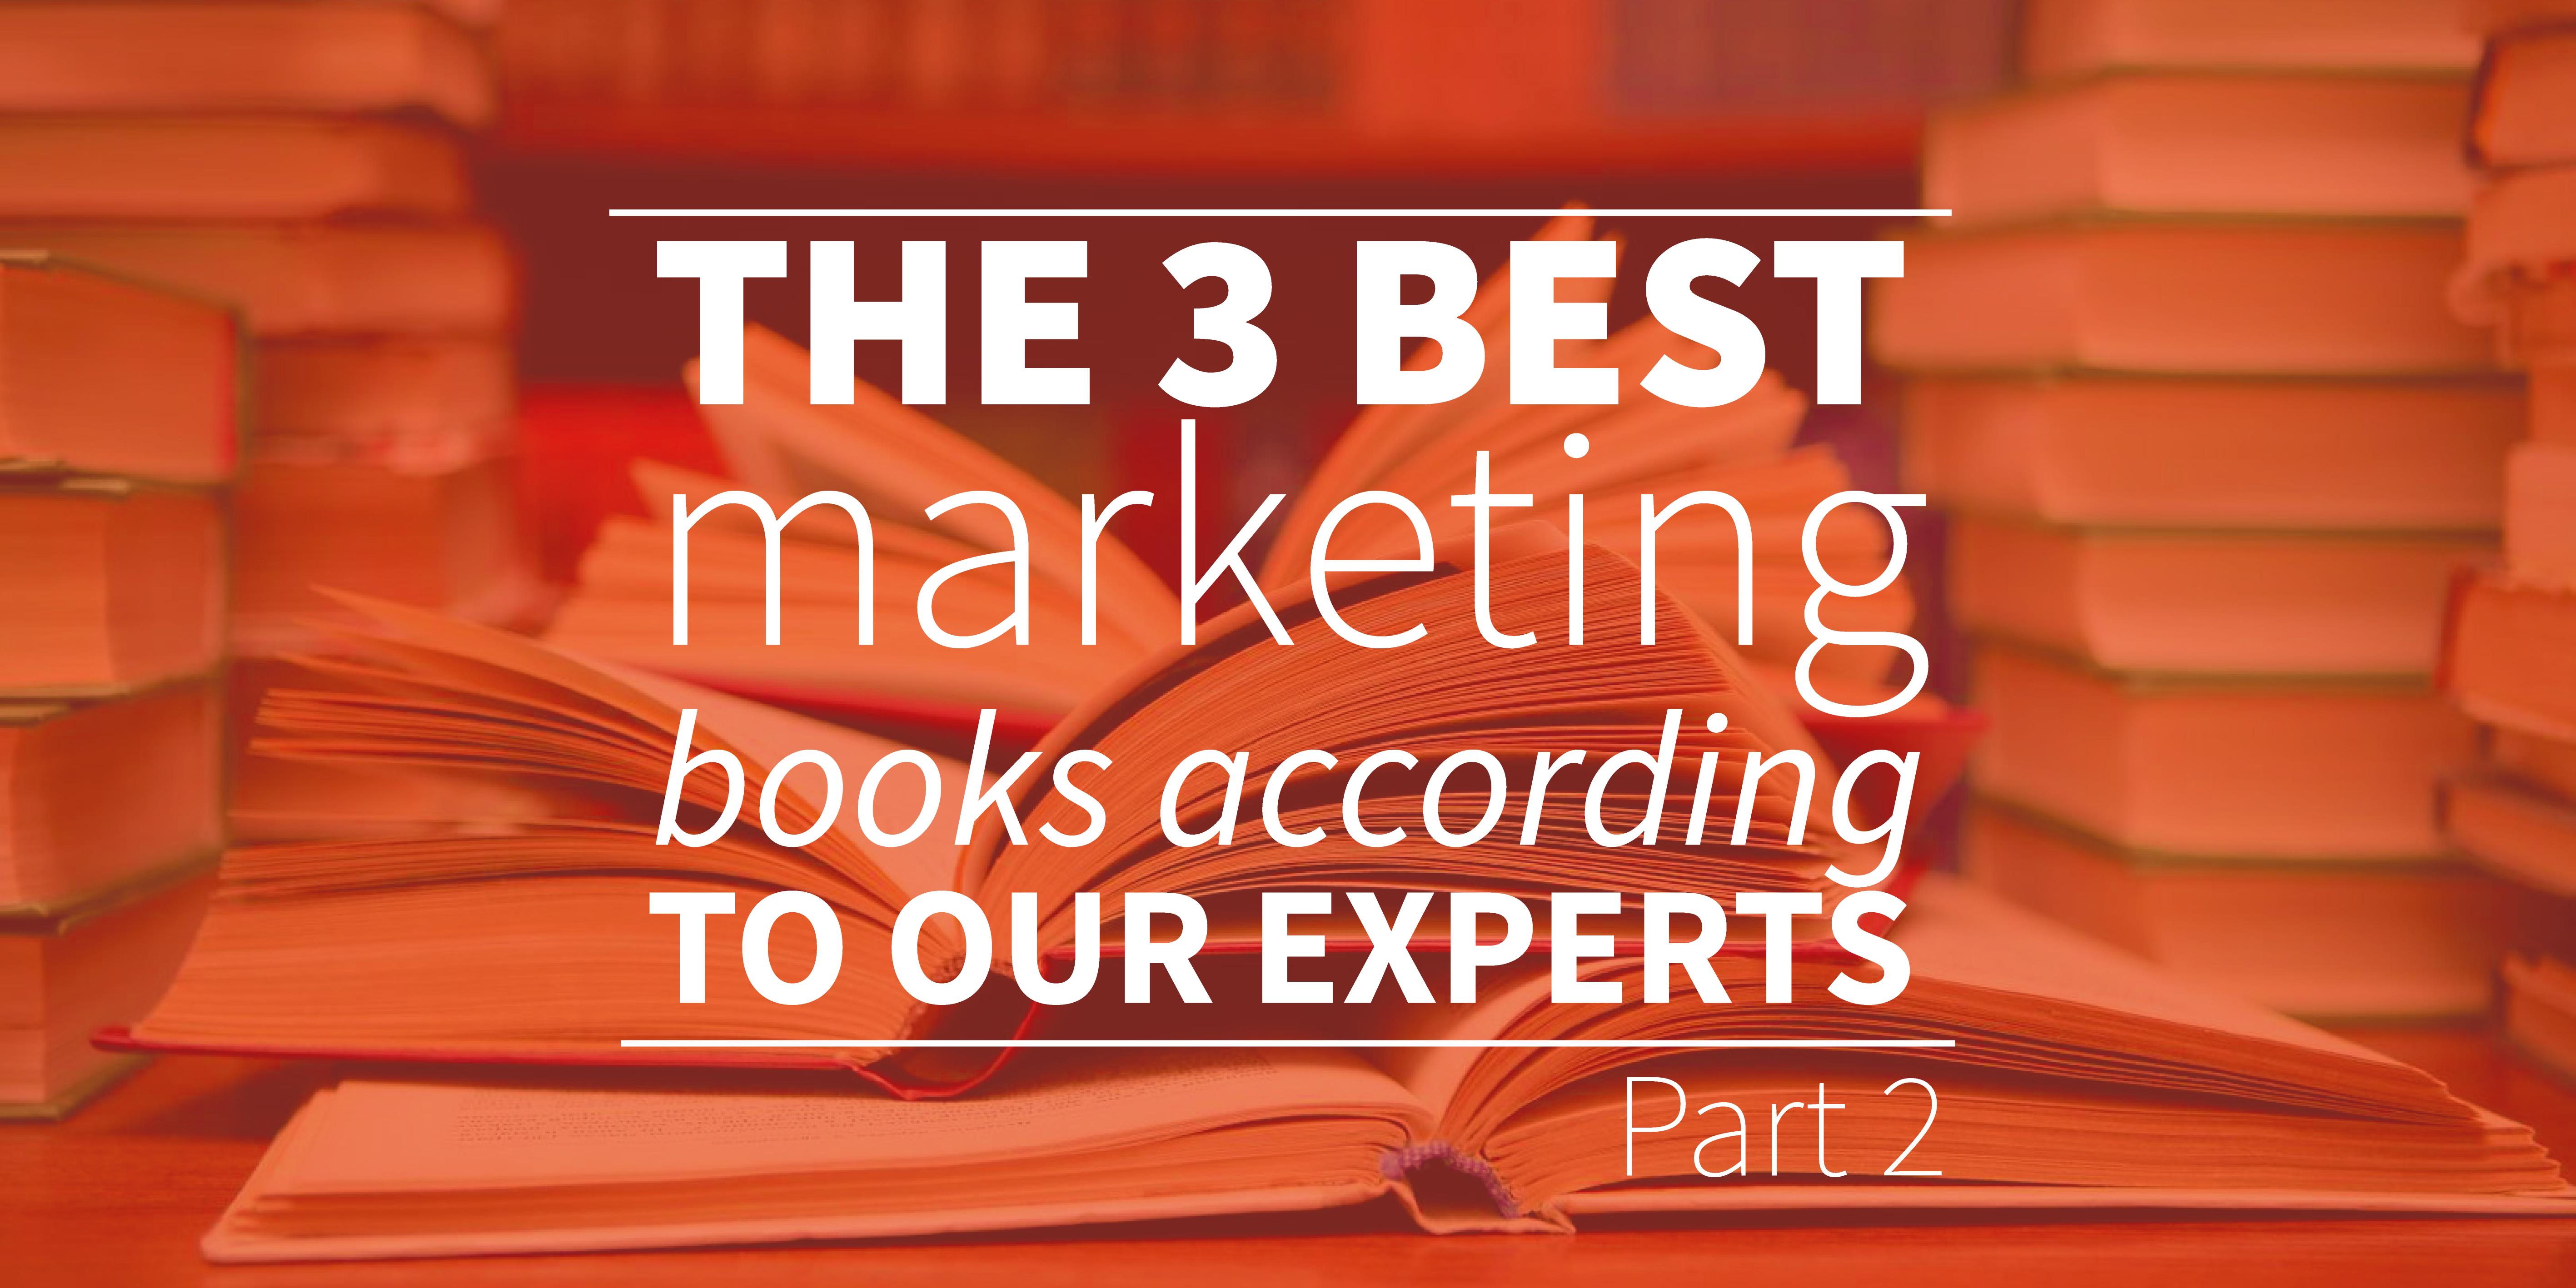 Beste Zaken Doen Best Marketing Books Part